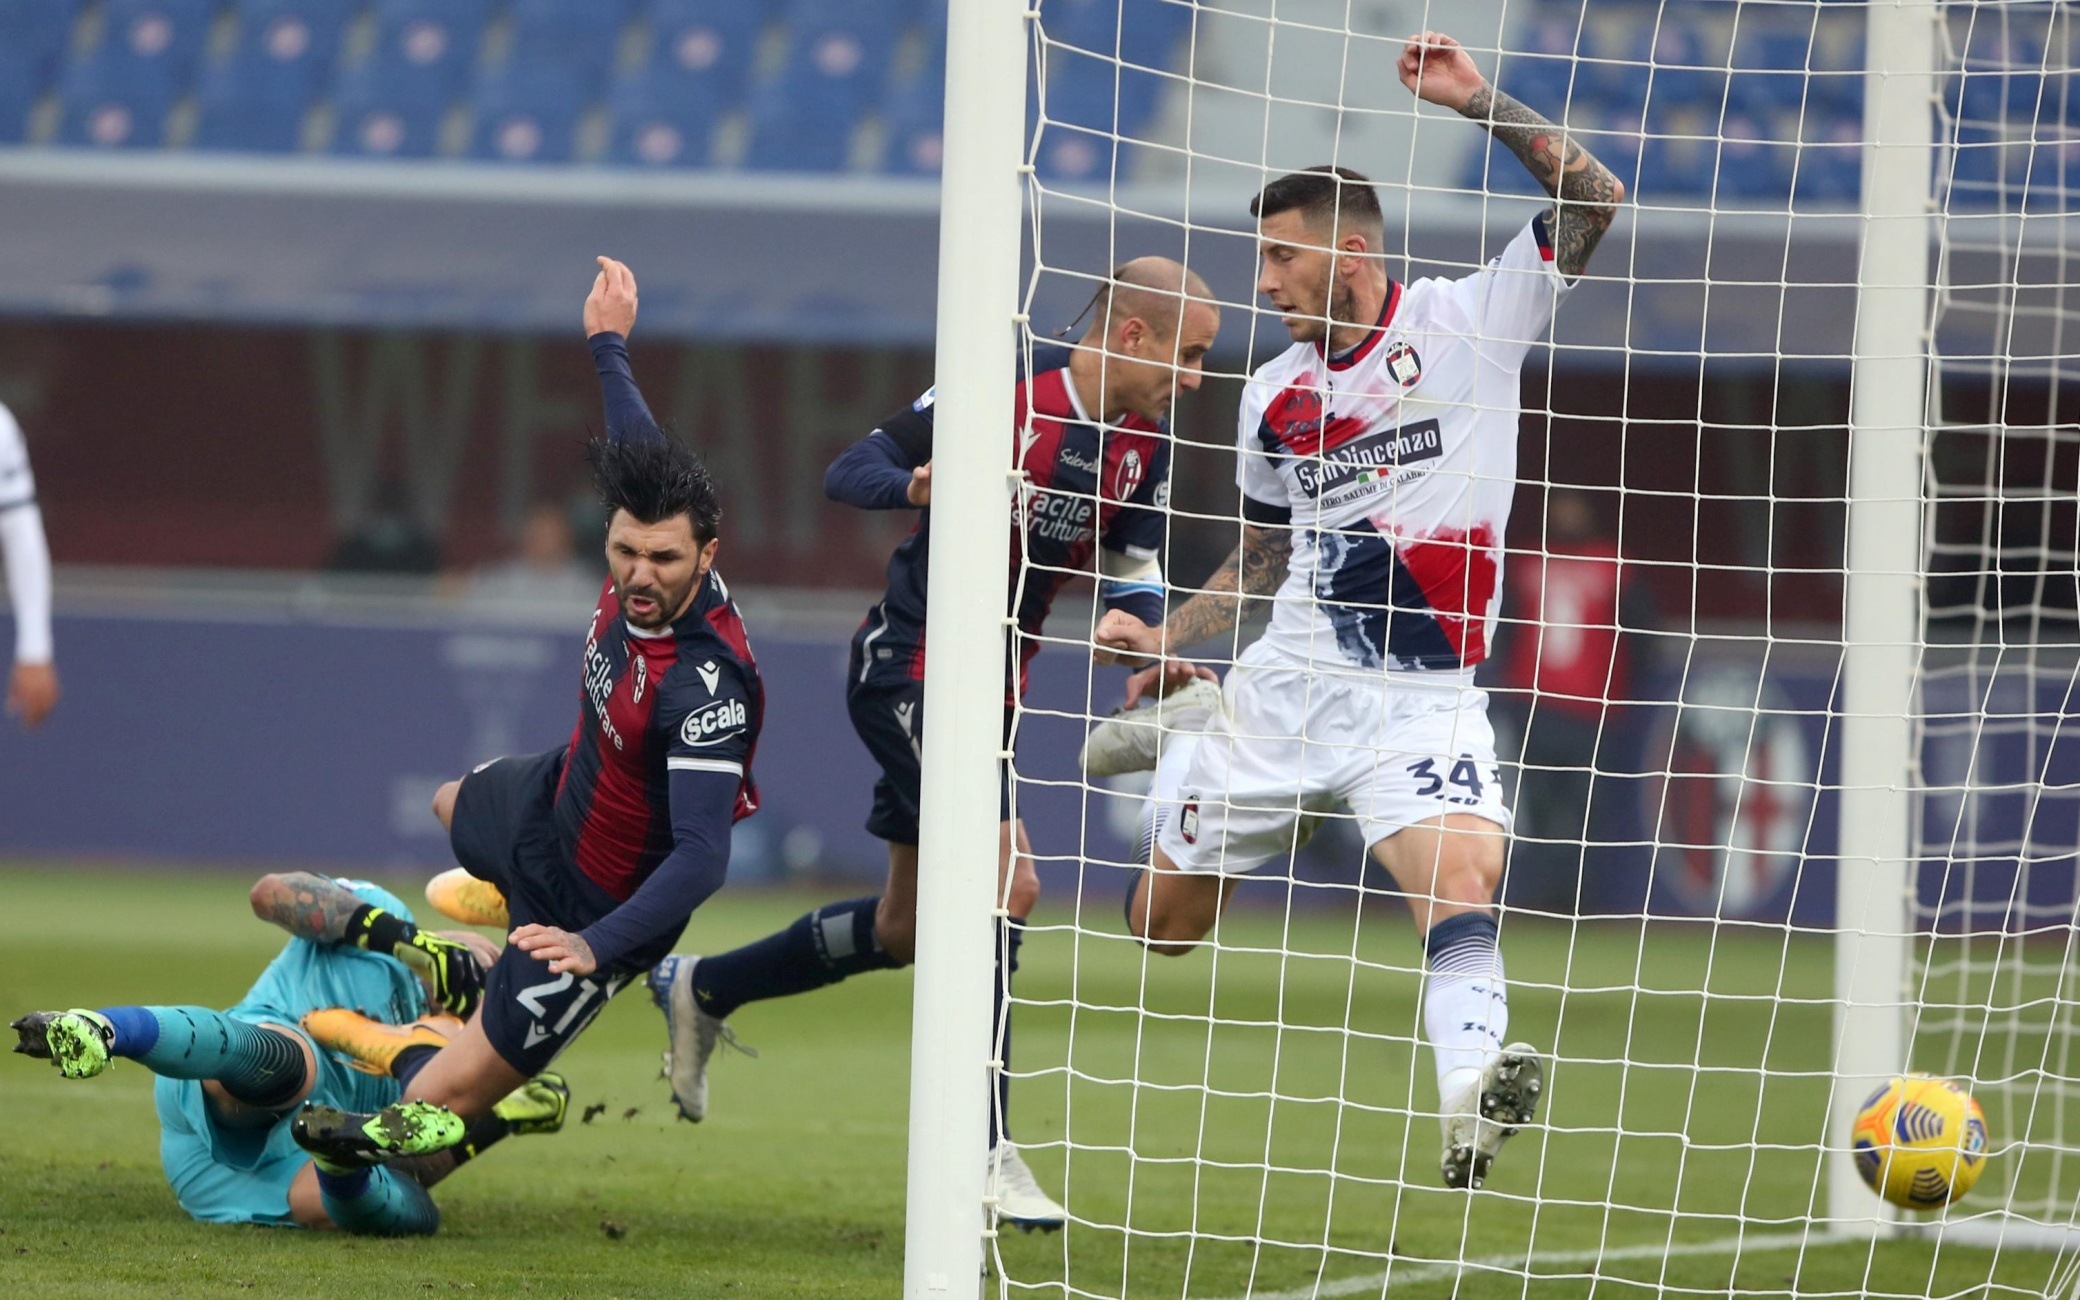 https://static.sky.it/images/skytg24/it/sport/2020/11/29/bologna-crotone-gol-tabellino-highlights-video-serie-a/bologna_crotone_2_ansa.jpg